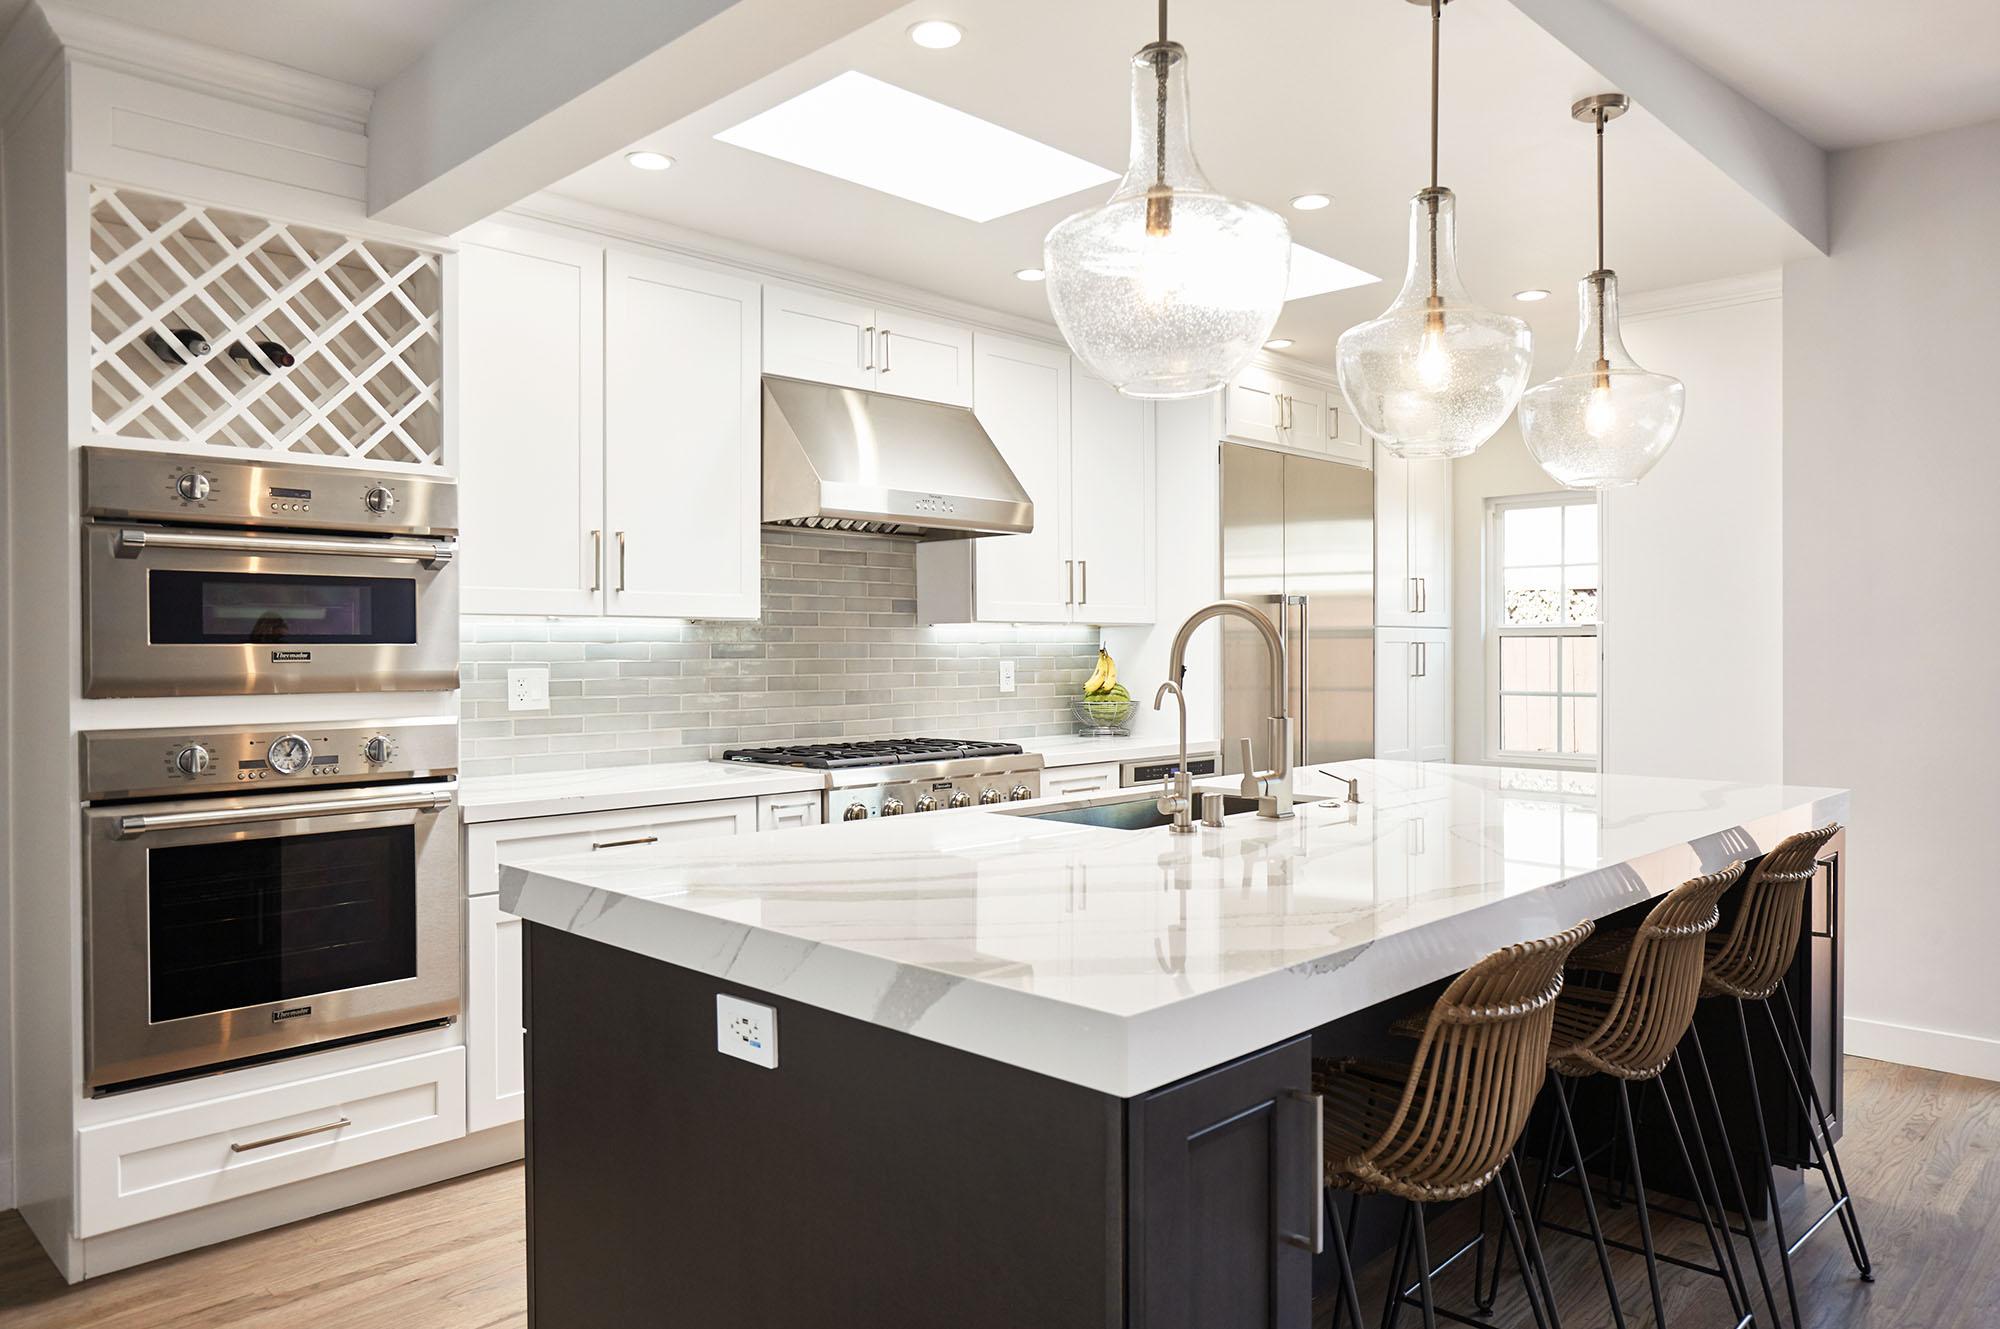 Studio City kitchen remodel 14 SMALL.jpg